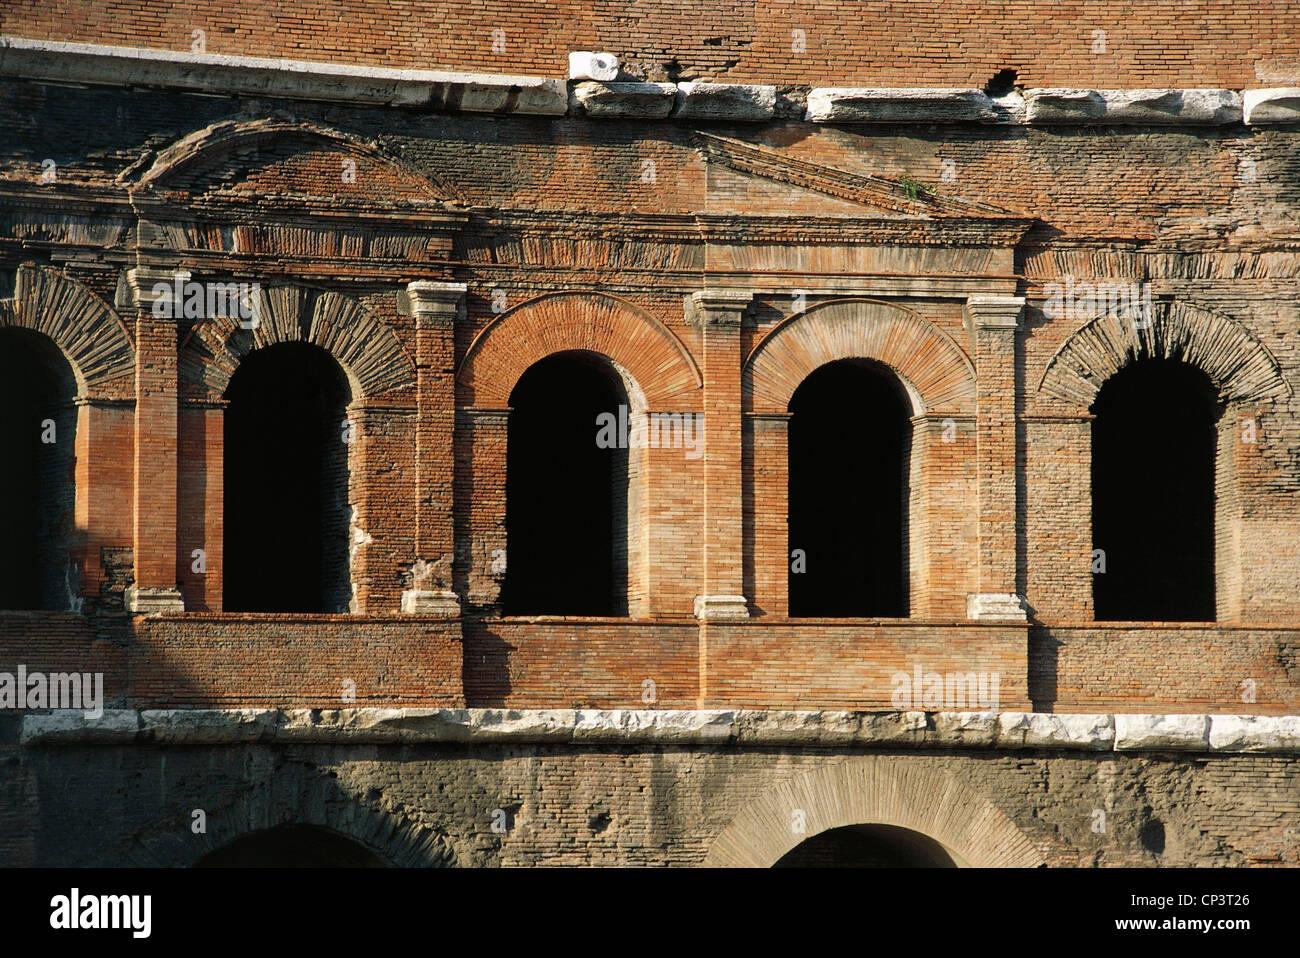 Lazio Rom Imperial Forum Forum des Trajan Trajans Märkte, ersten Jahrhundert n. Chr., Architekt Apollodorus Stockbild